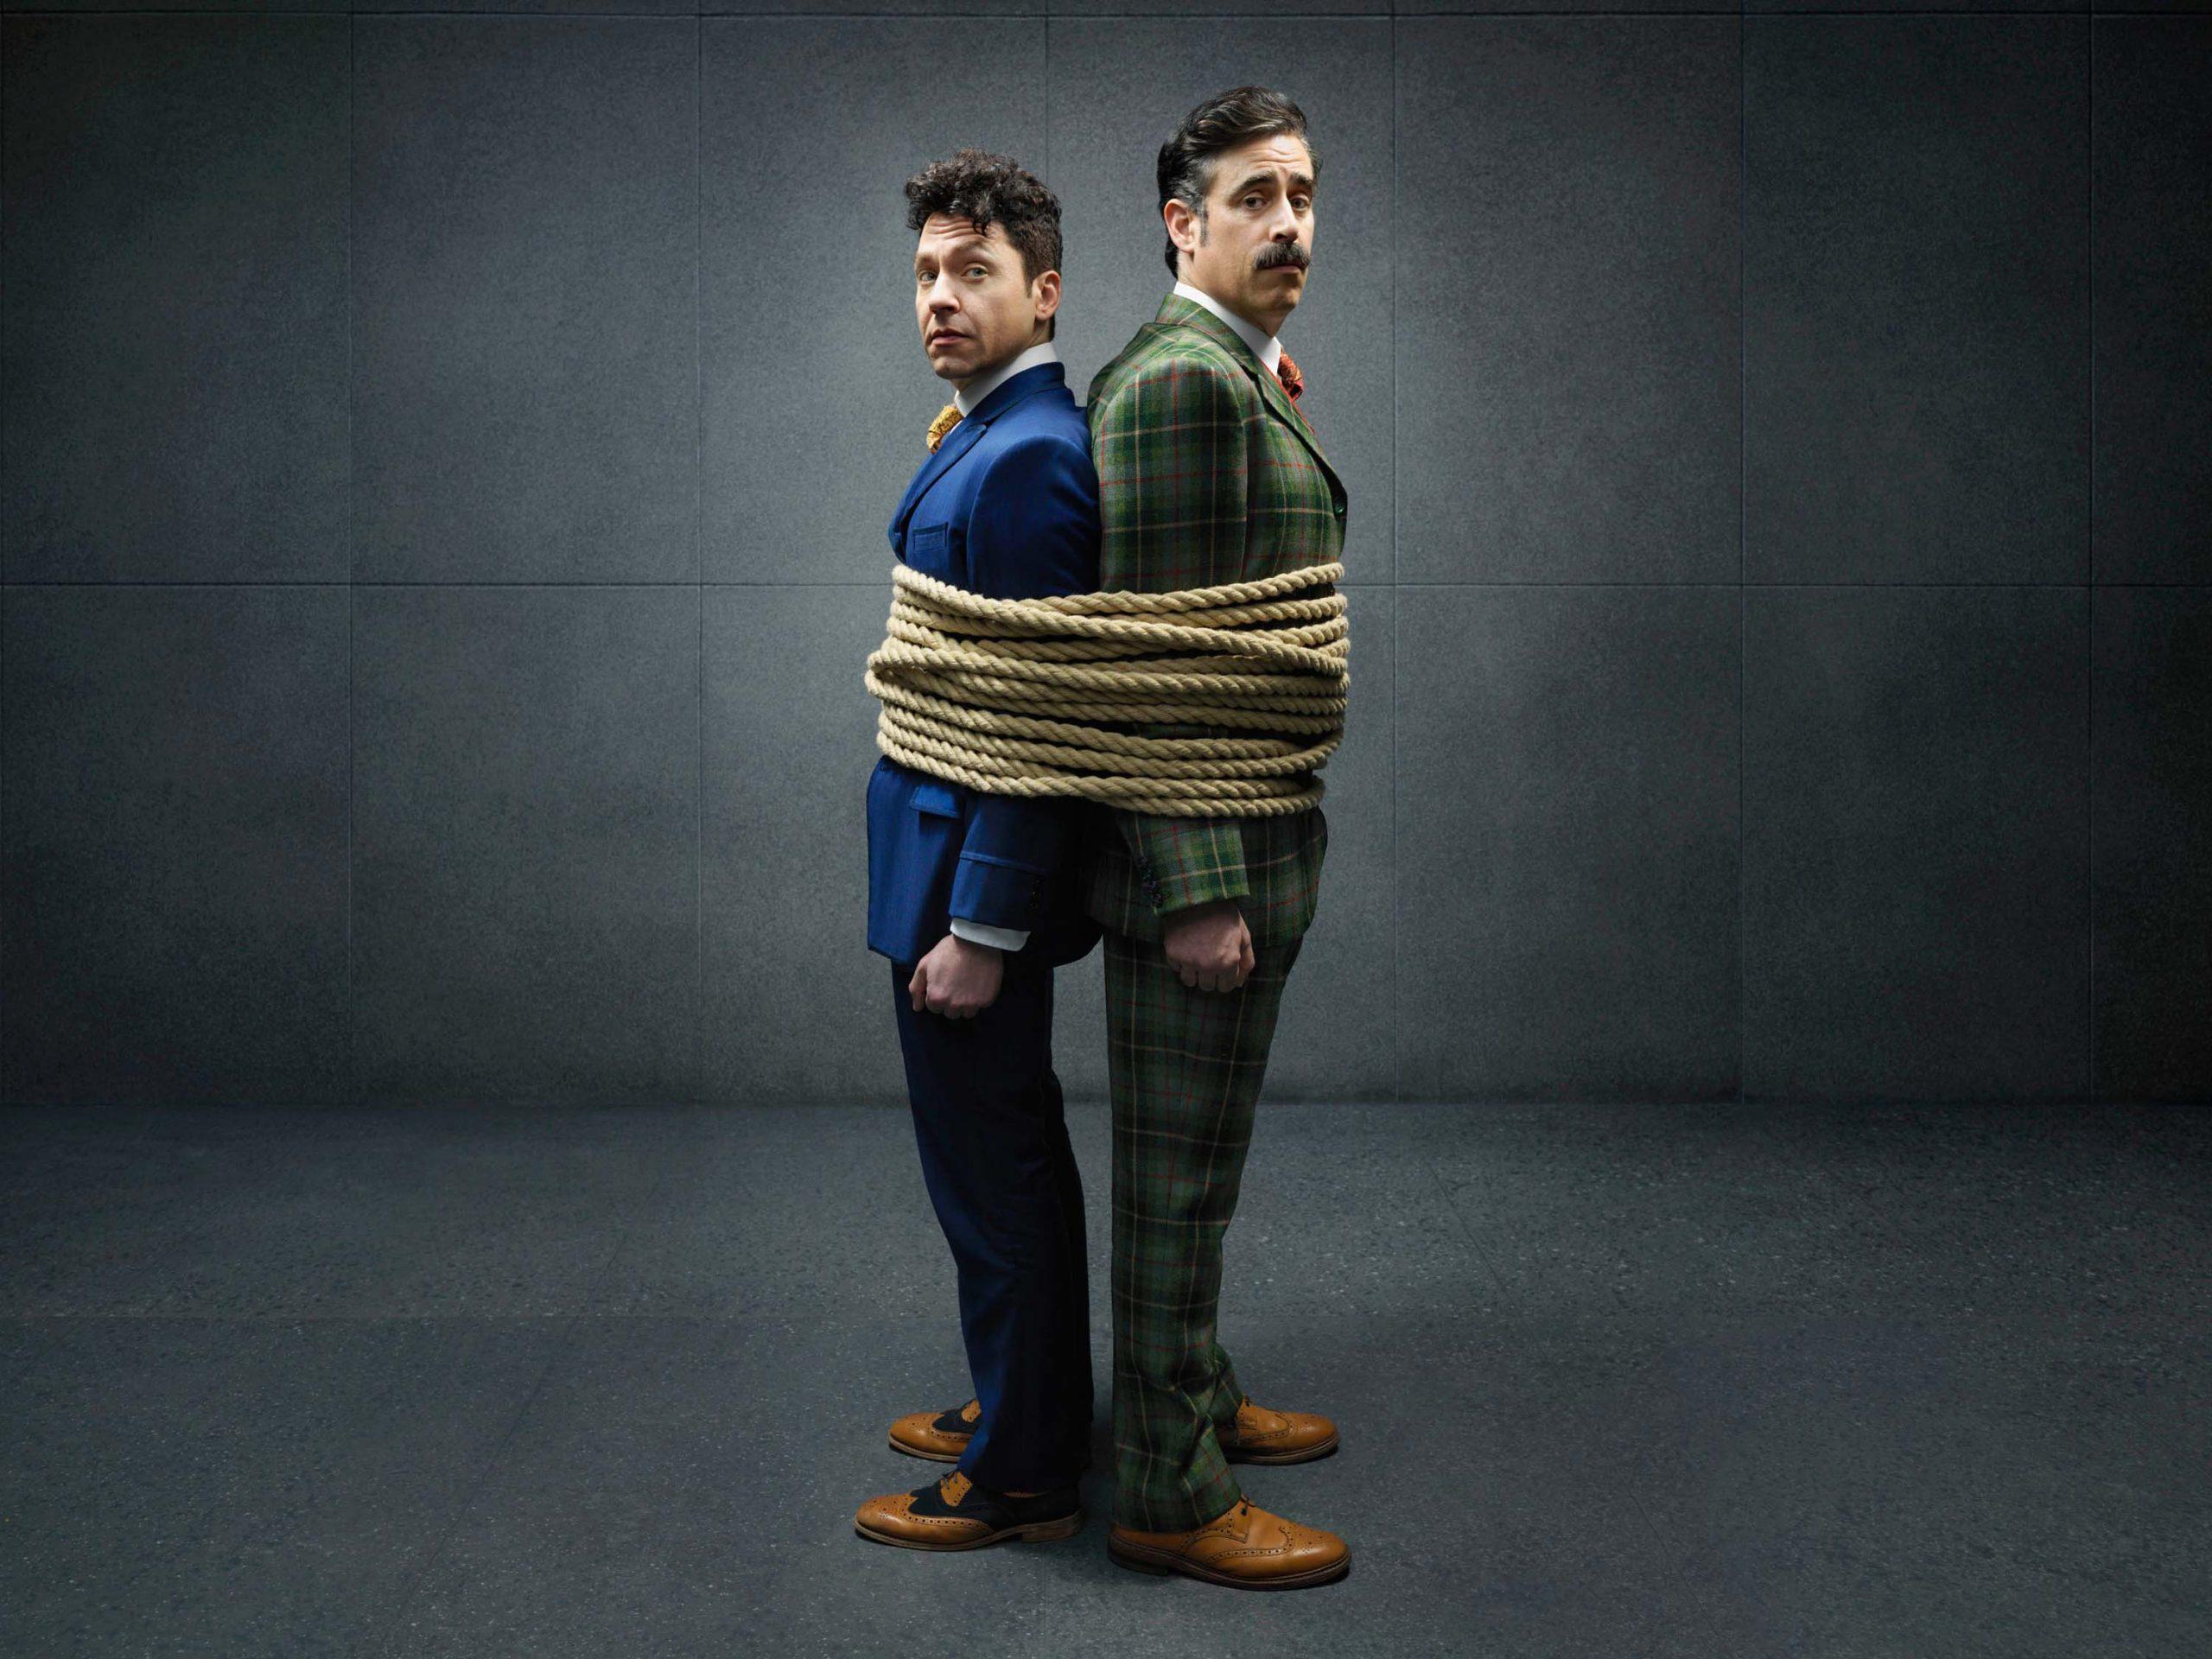 wren_agency_david_stewart_ITV_Houdini_and_Doyle